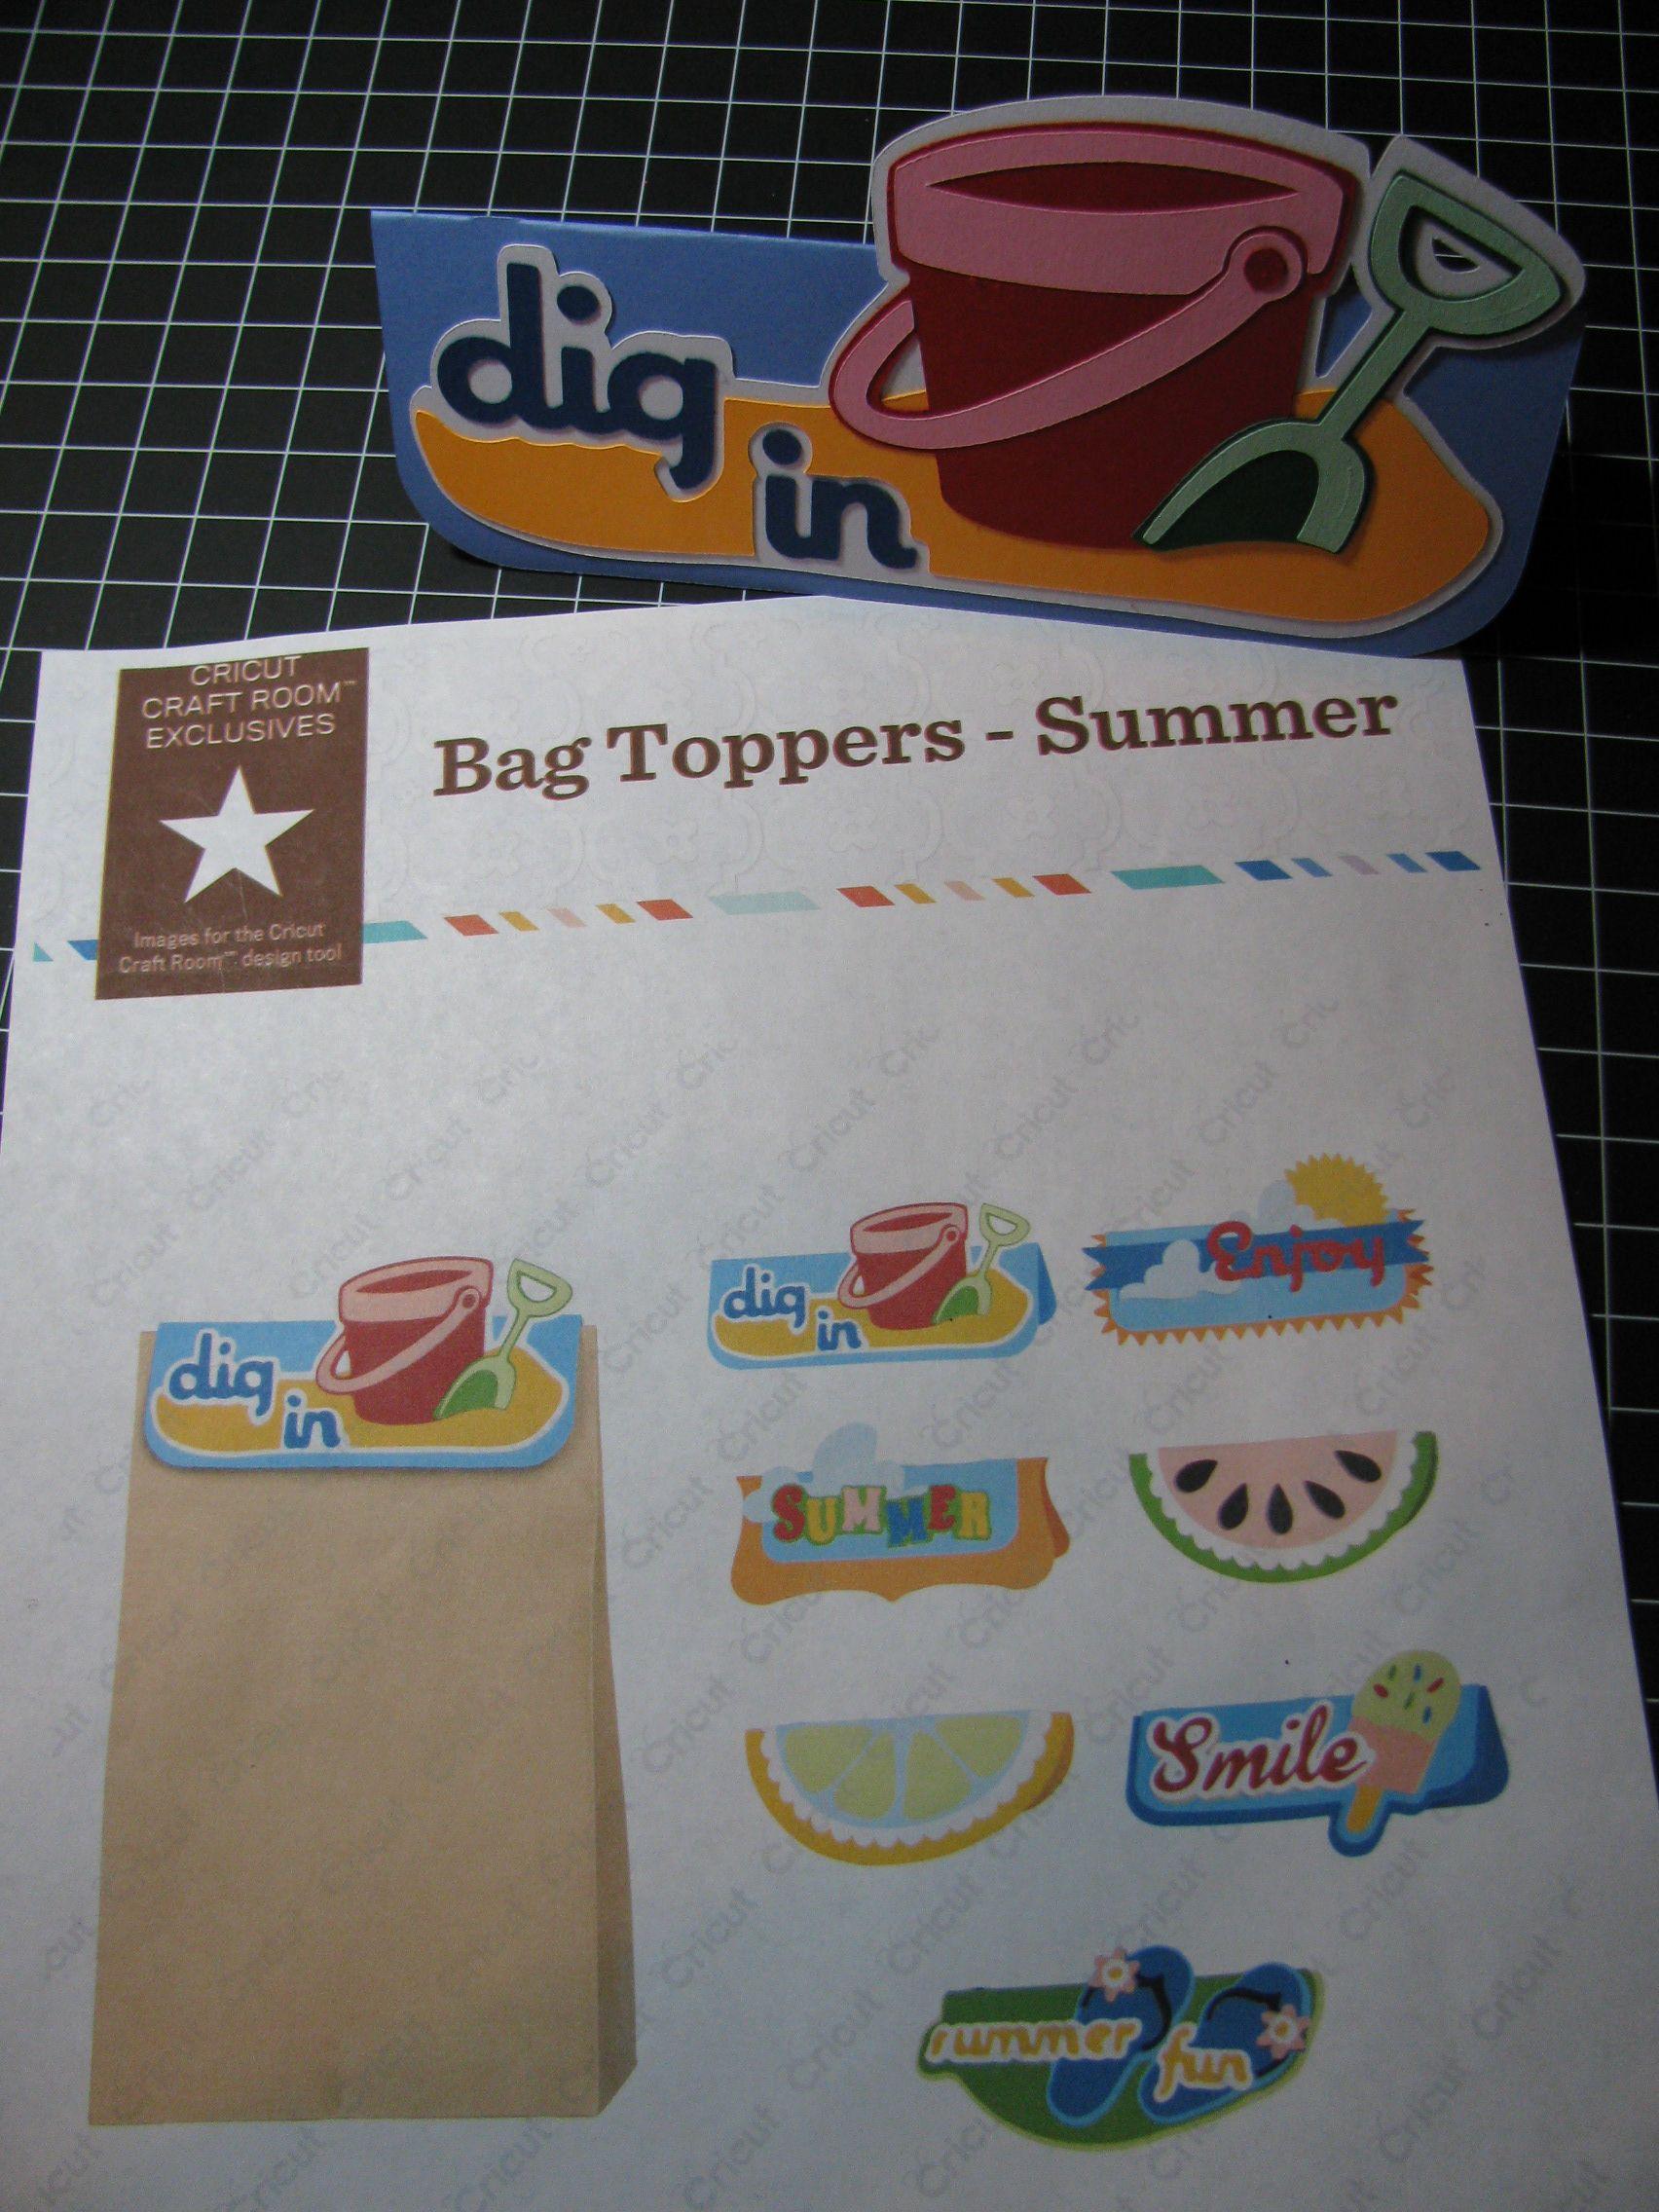 Cricut Craft Room Bag Topper Digital cartridge So much fun to